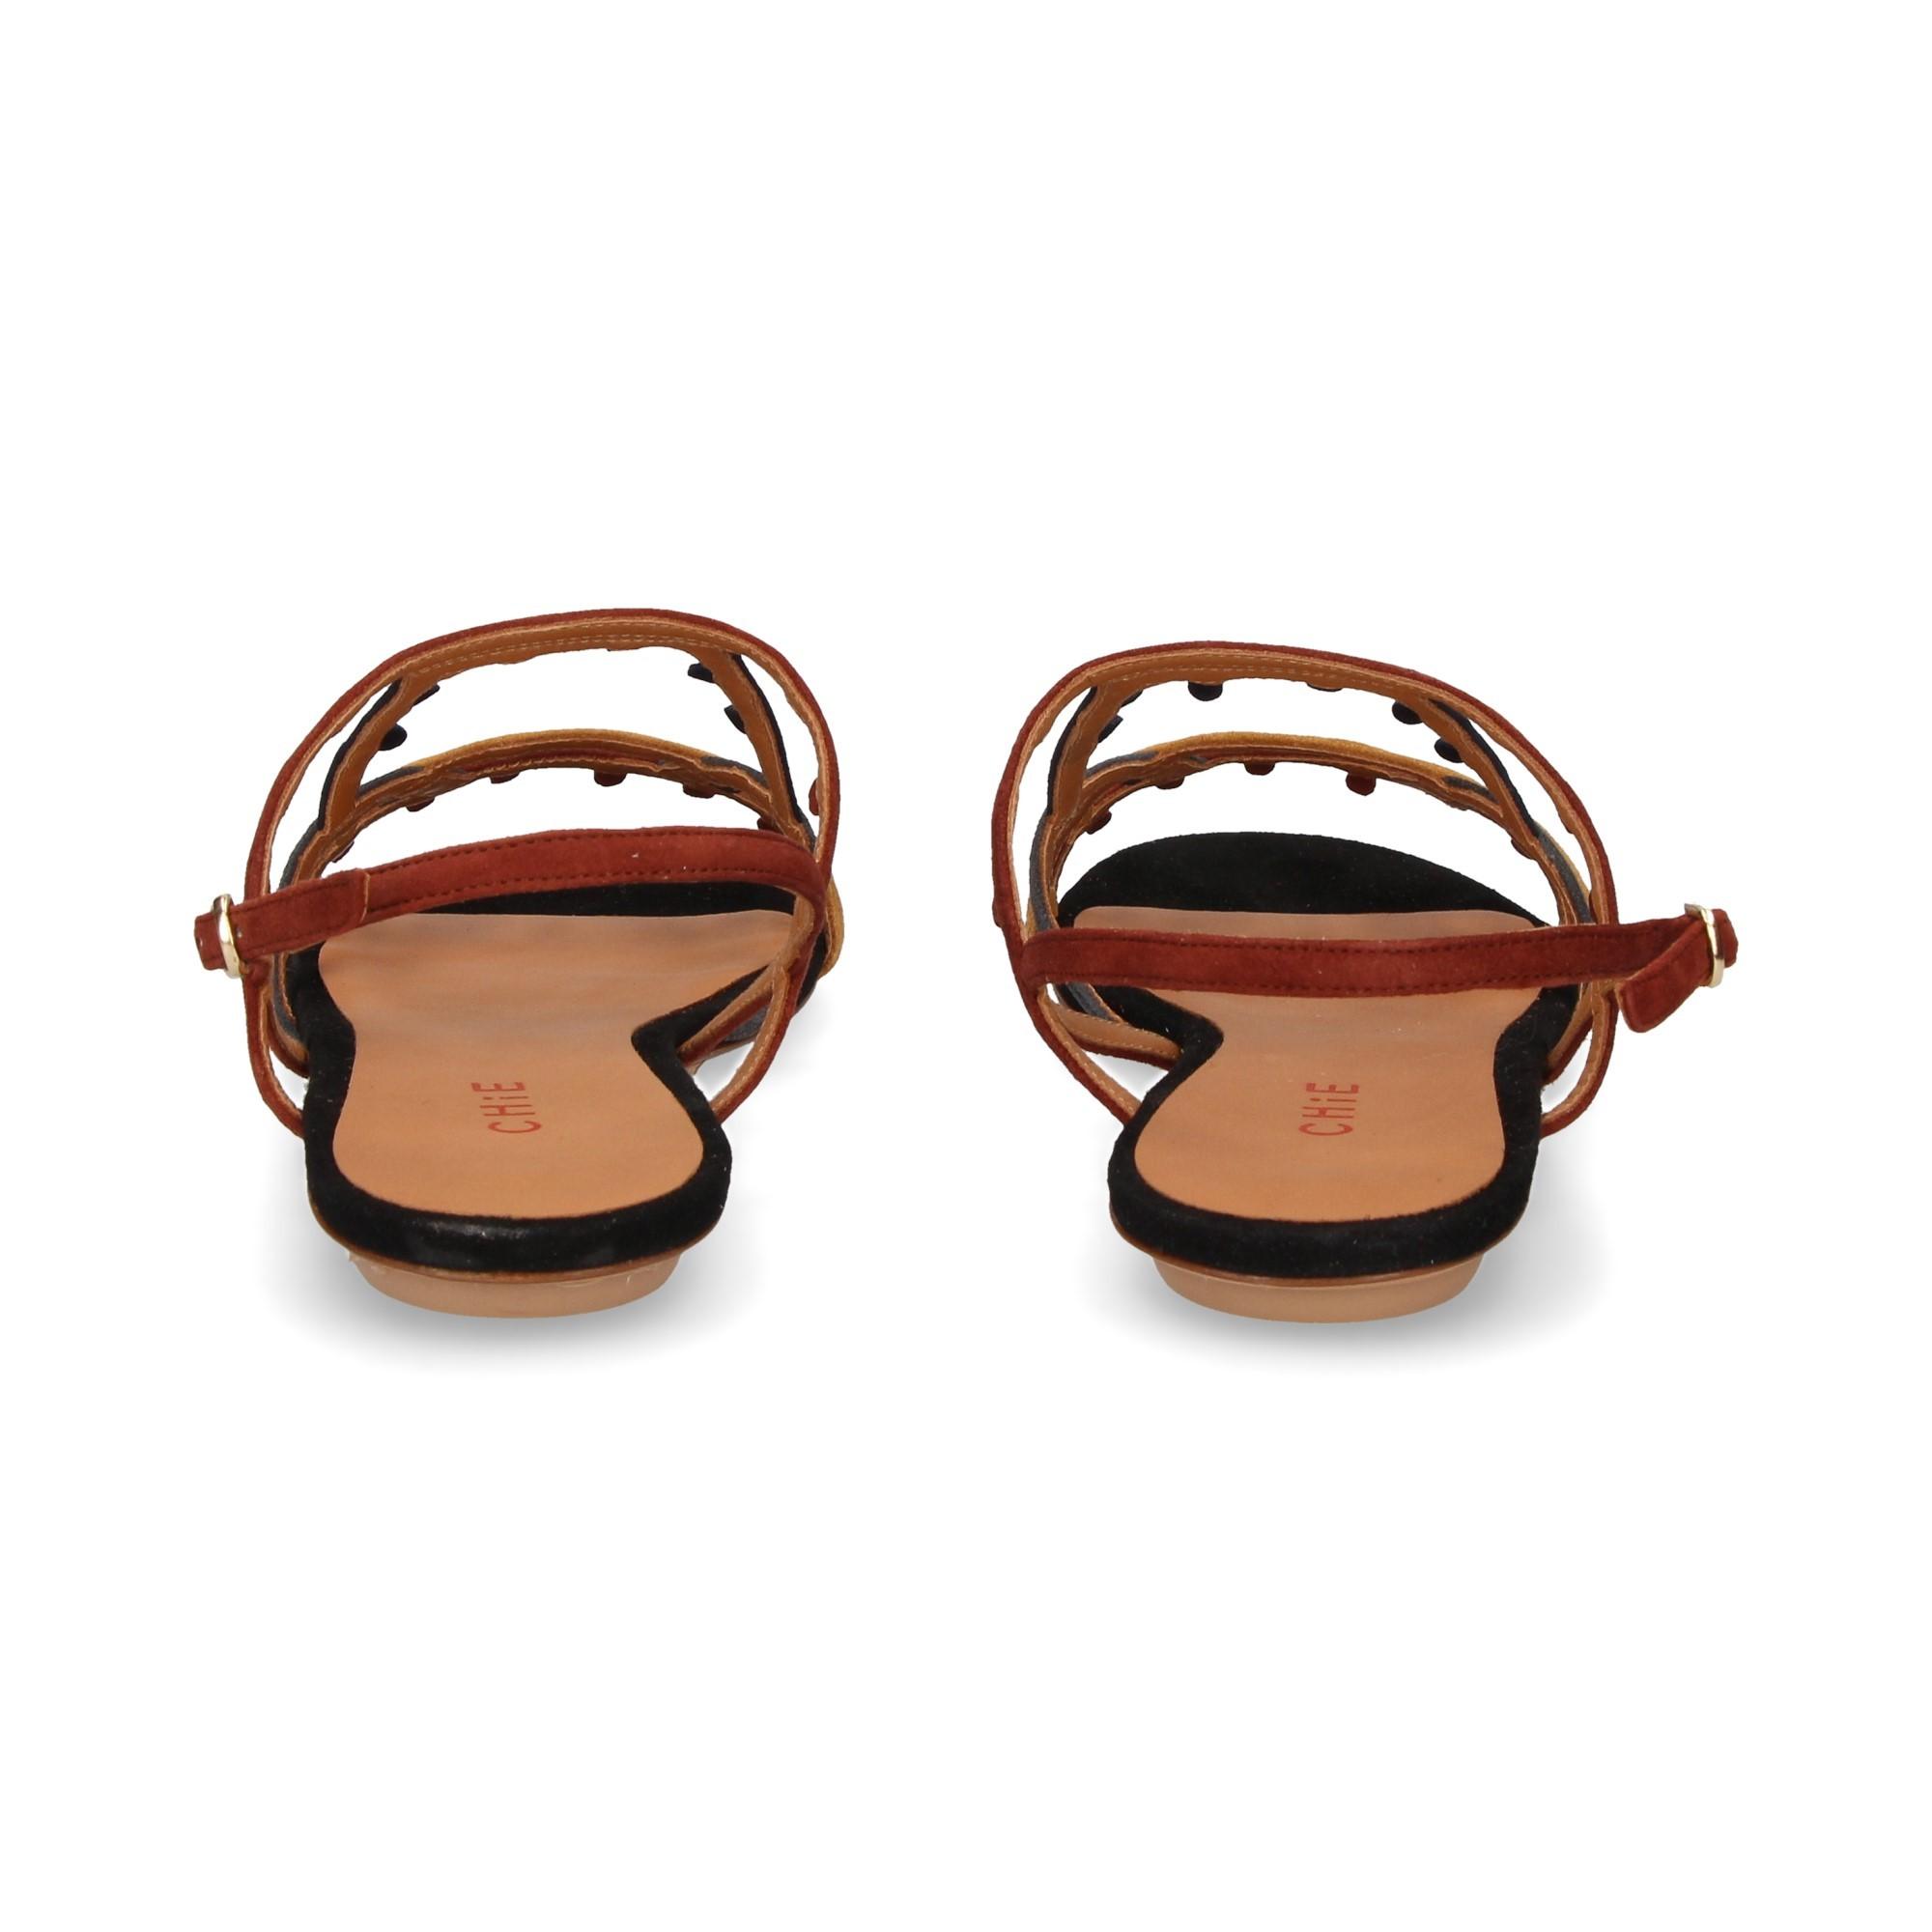 Femmes Marron Chie Yamal Plates Mihara Multi Sandales Pour 0OXwP8nk